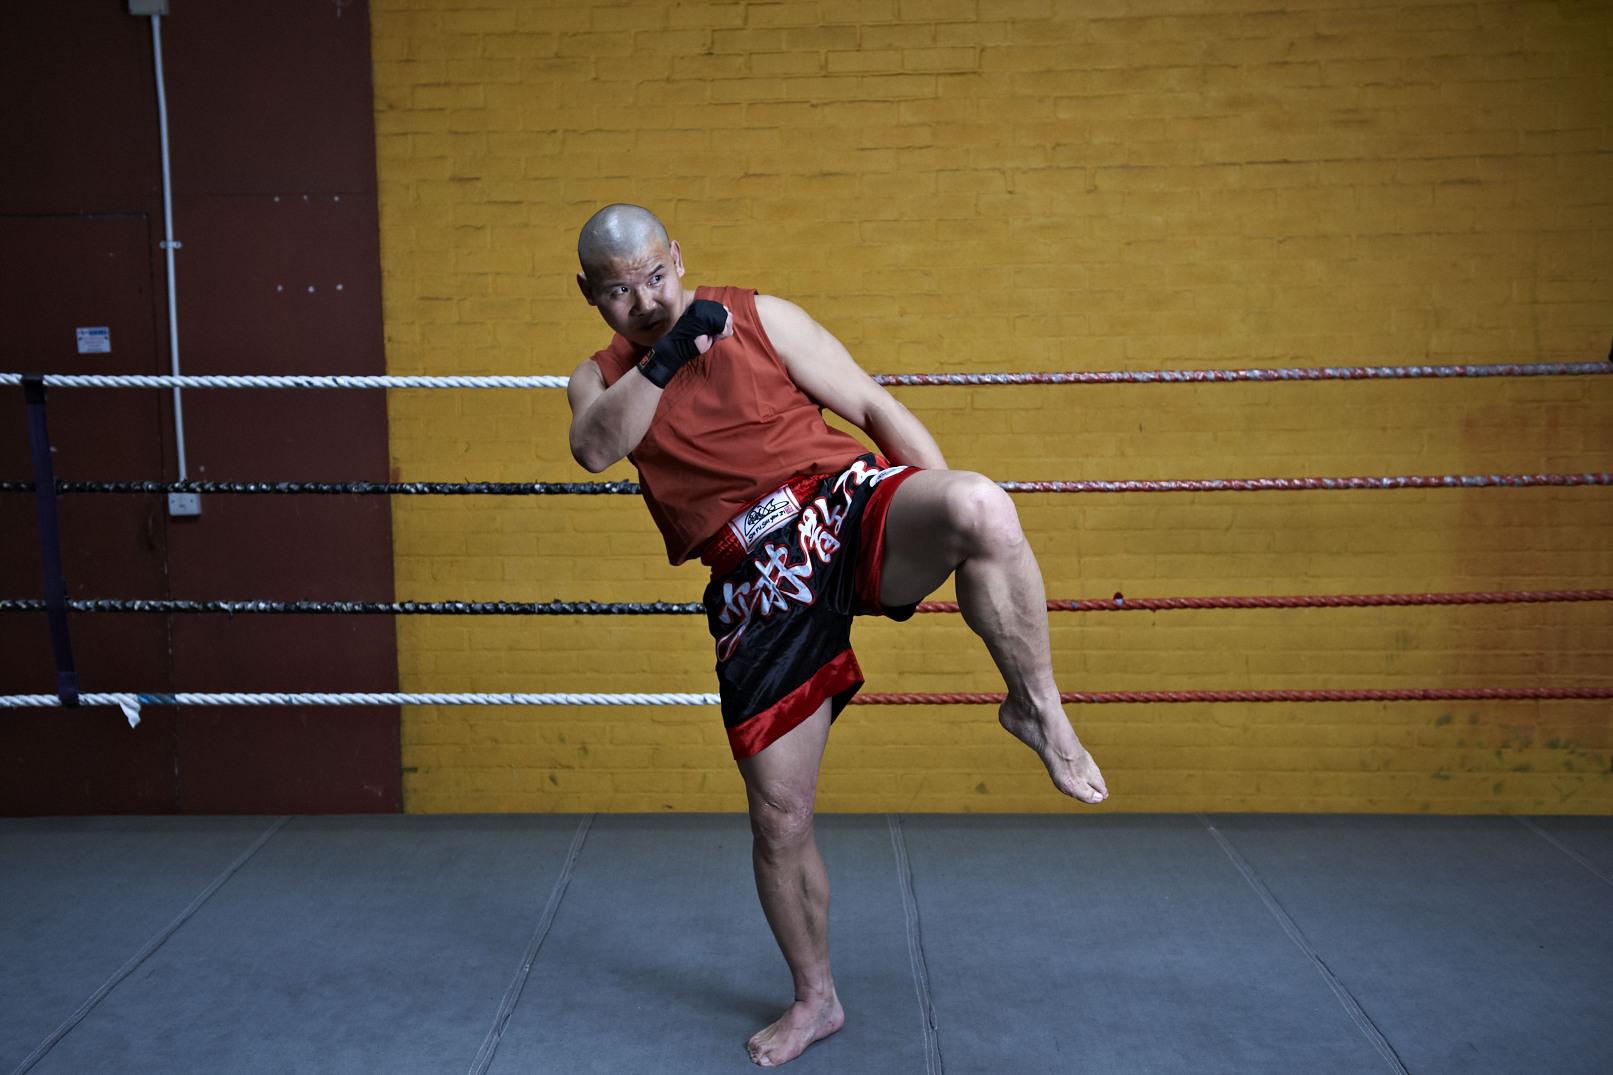 Shaolin temple uk shifu yanzi kick 25.jpg